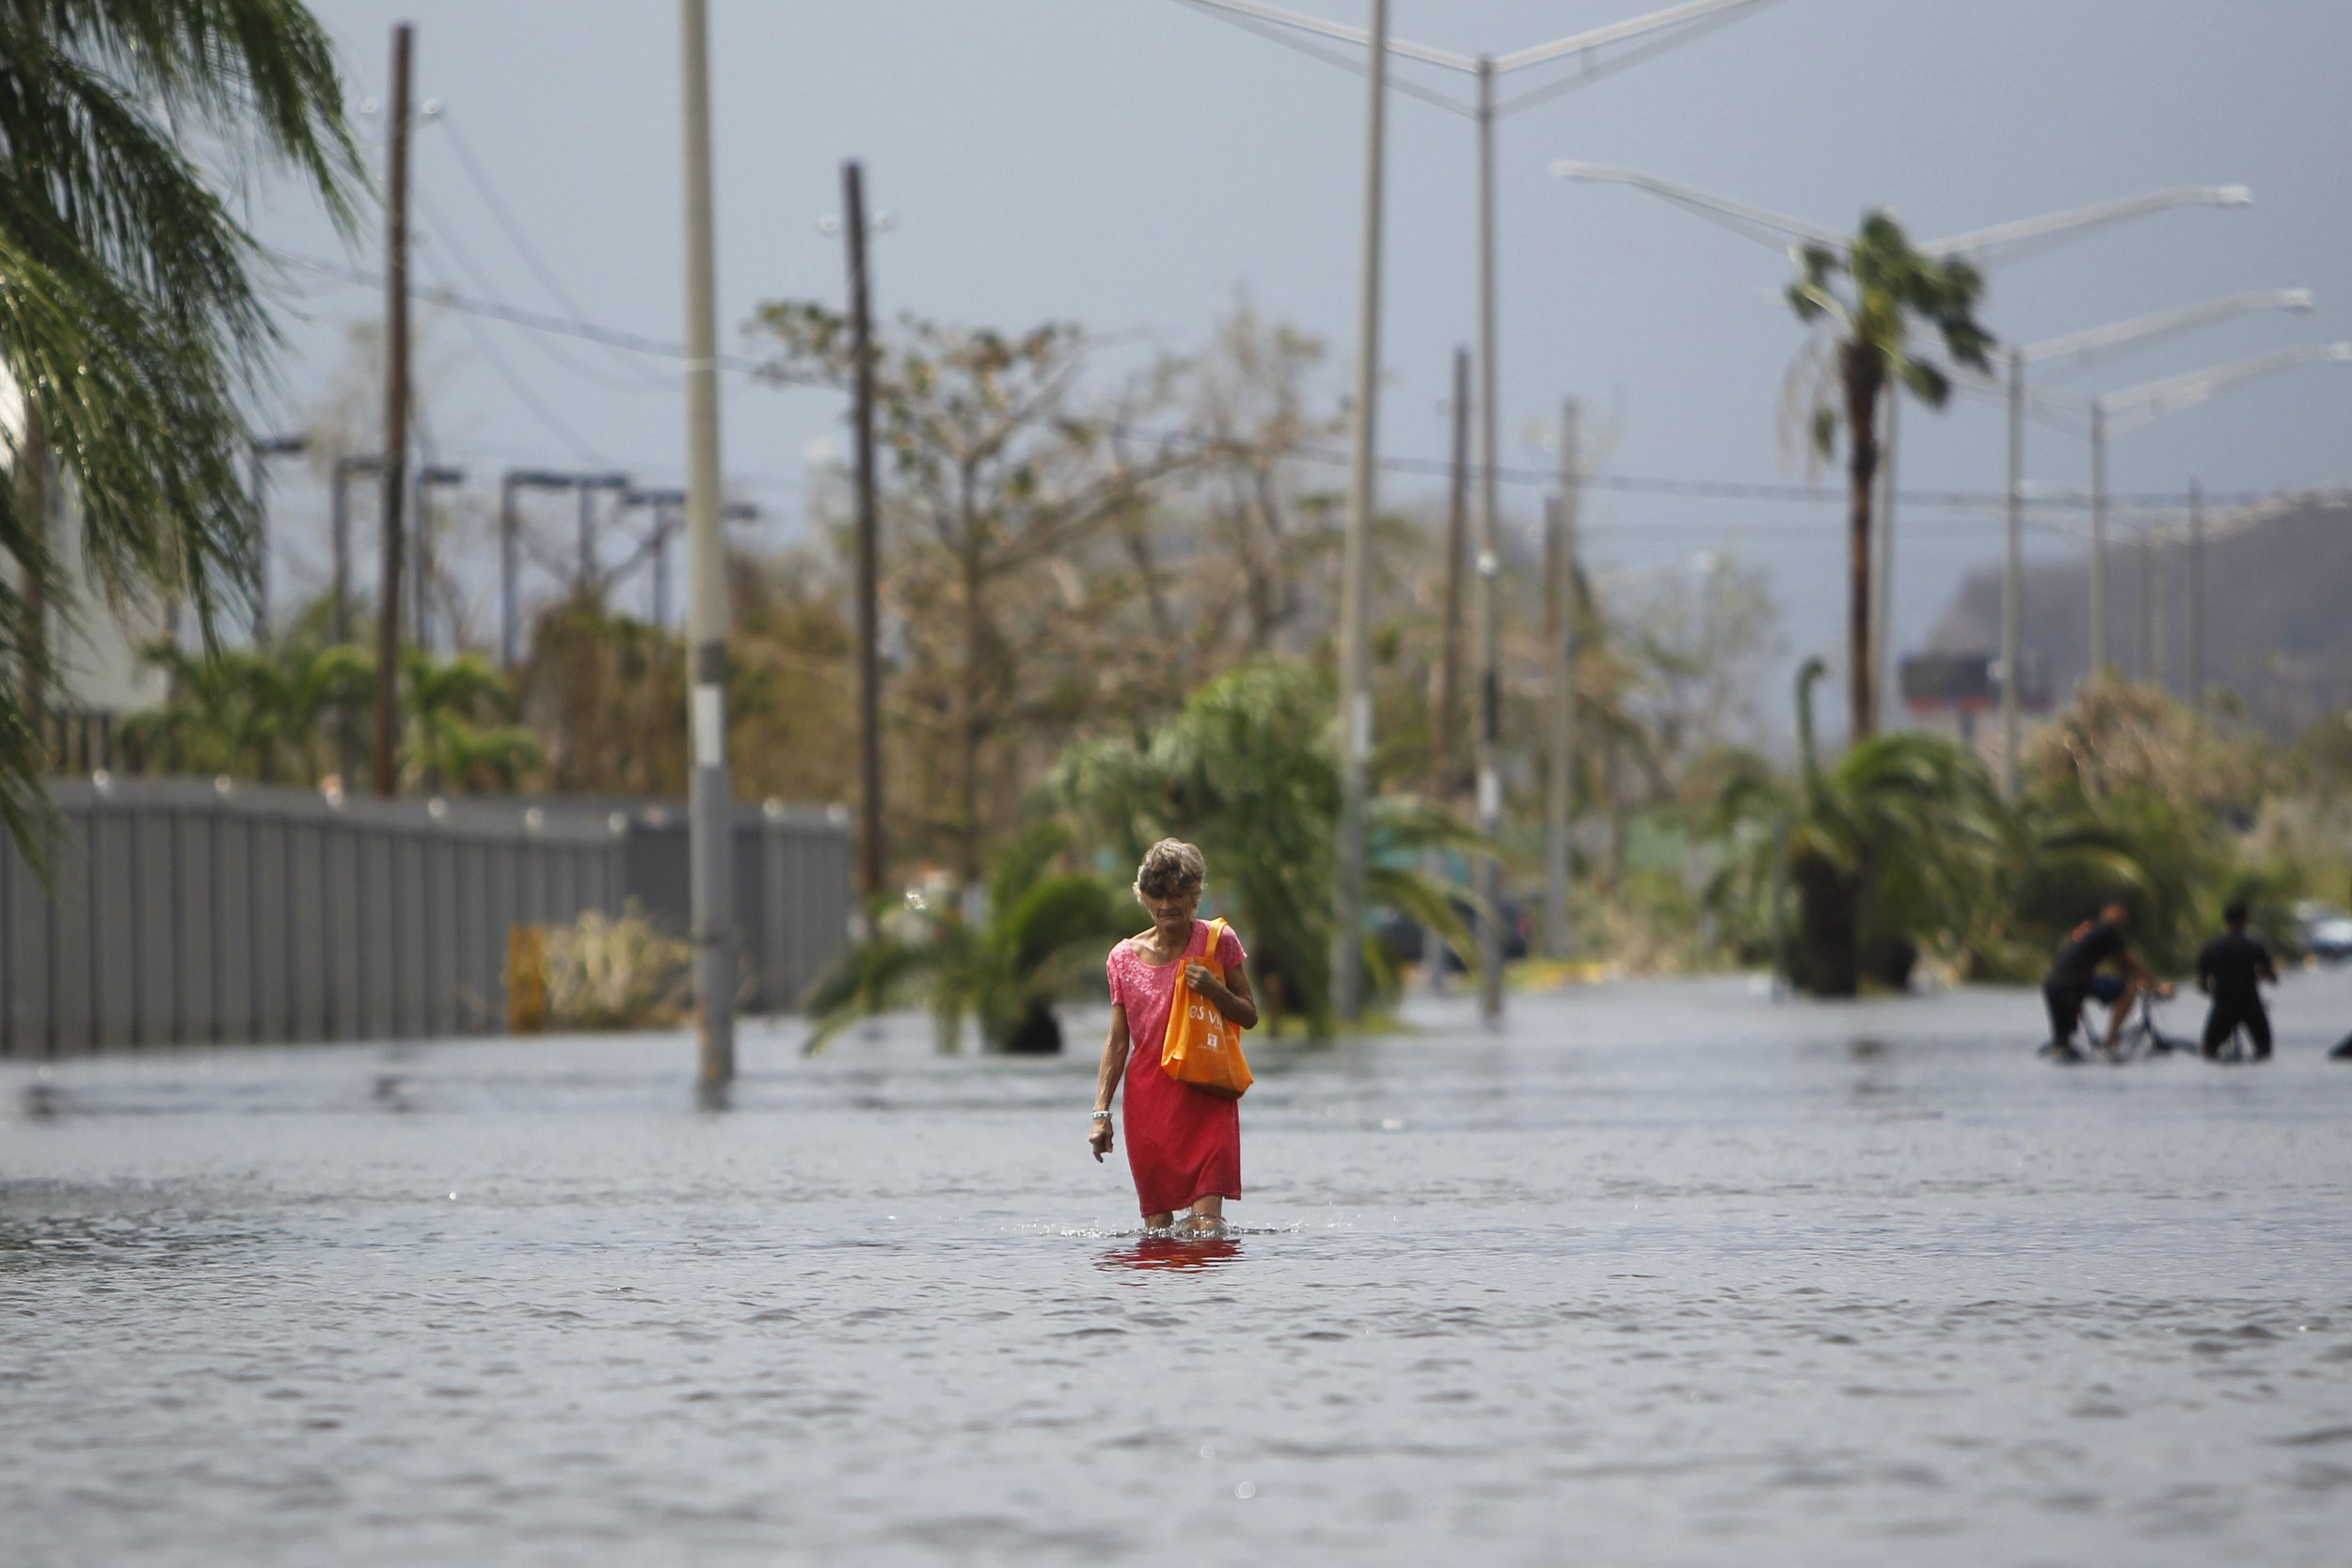 Flash flooding in Puerto Rico as Hurricane Maria causes huge dam to fail